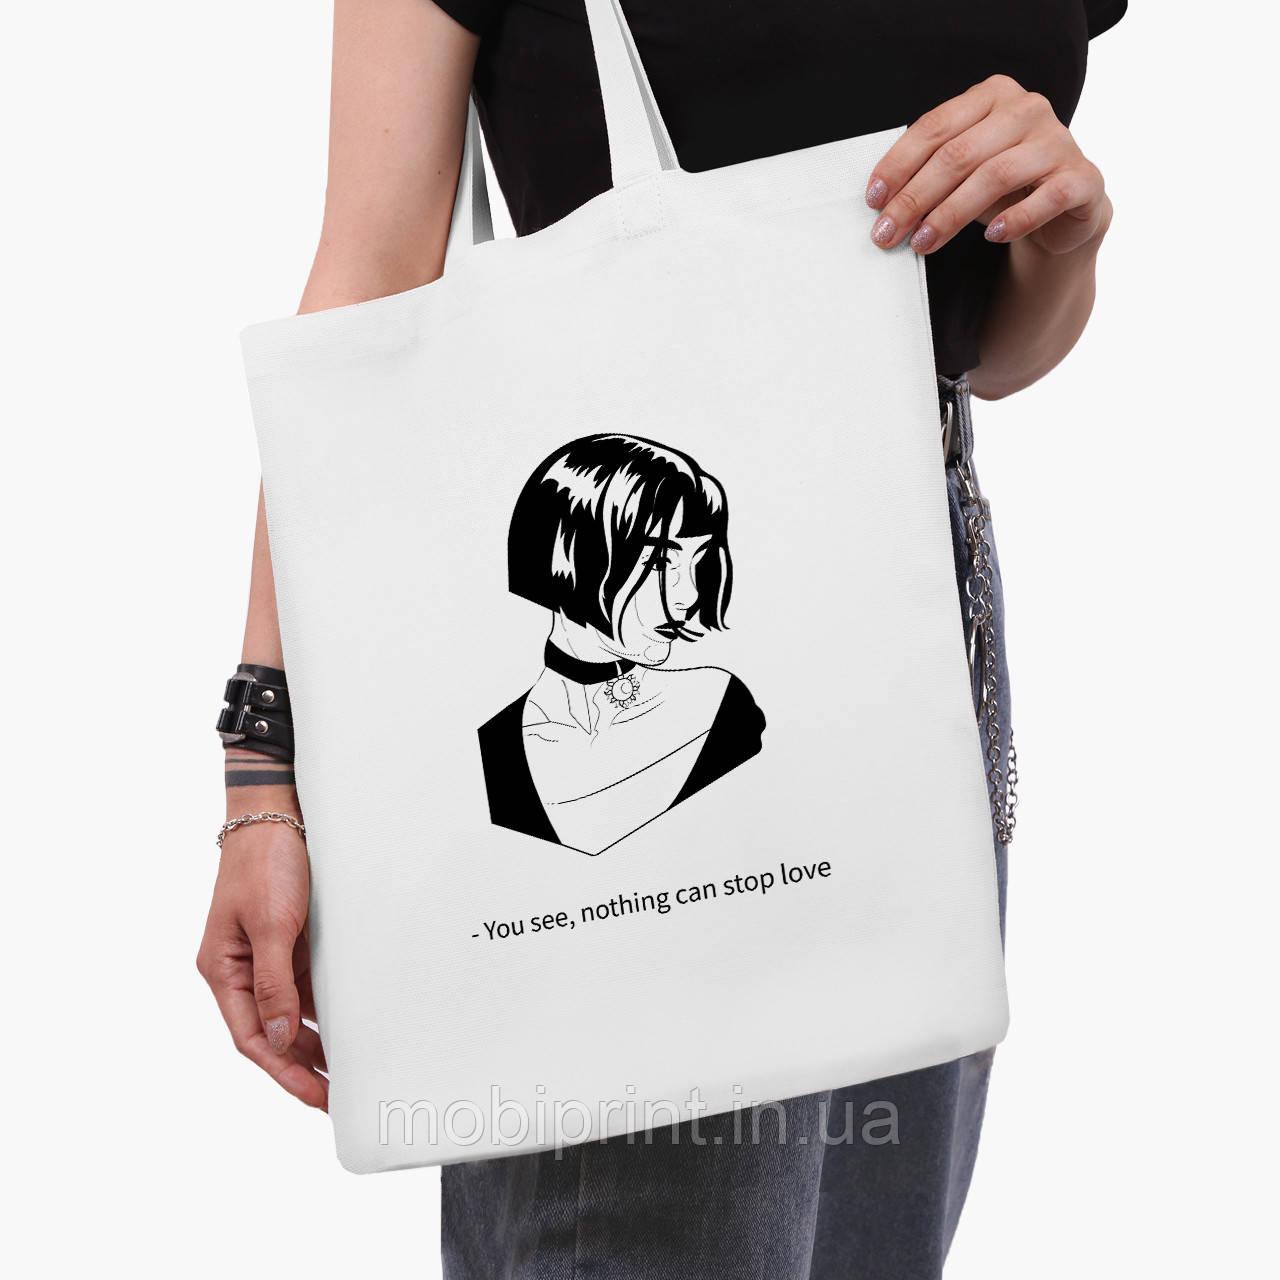 Эко сумка шоппер белая Леон киллер (Leon) (9227-1450-3)  41*35 см